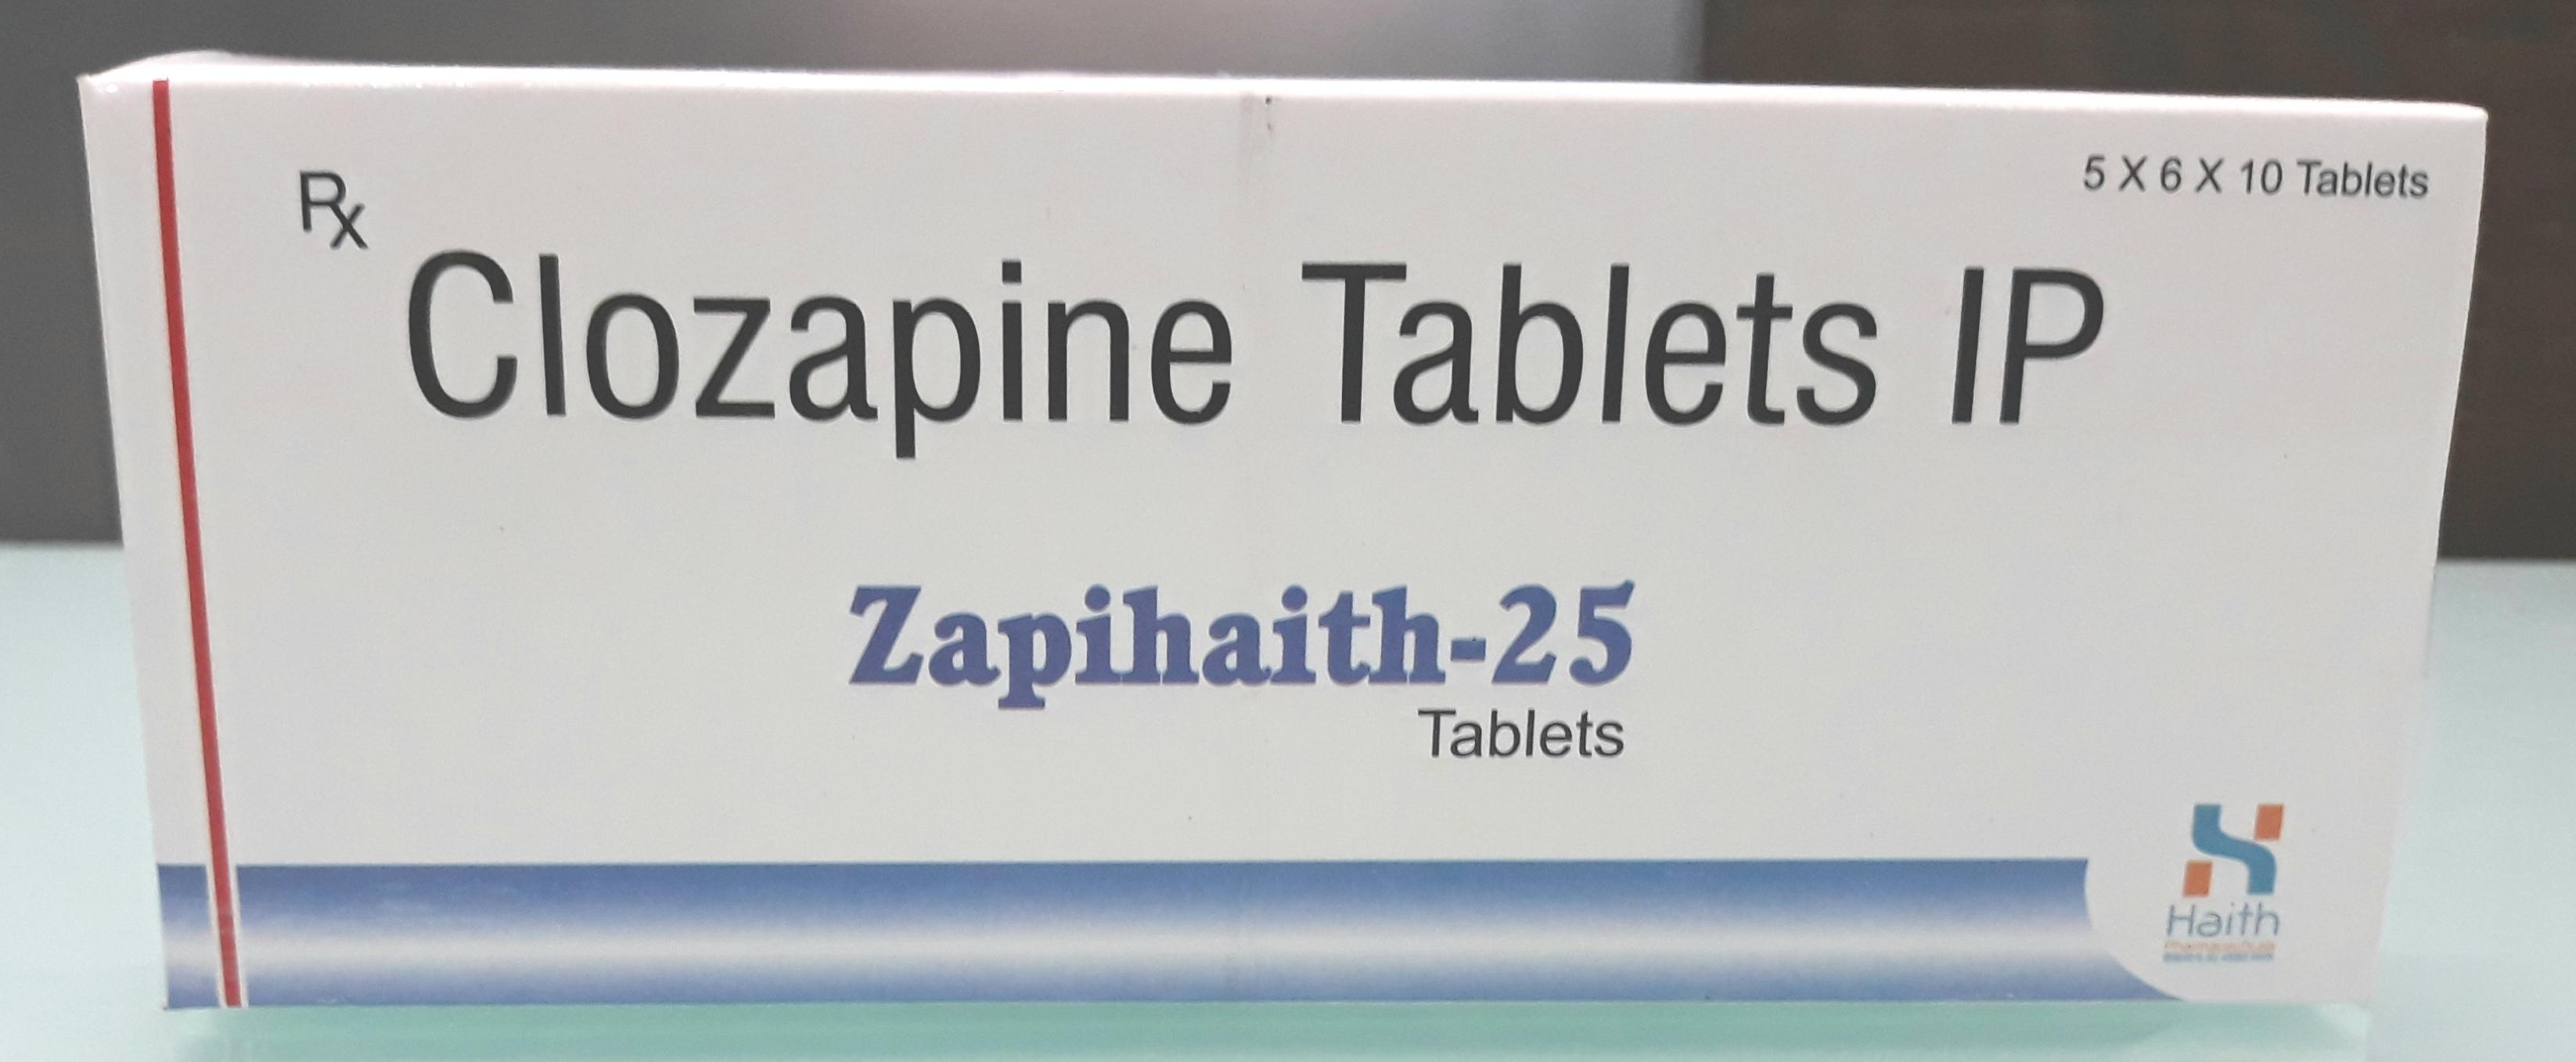 Clozapine Tablet